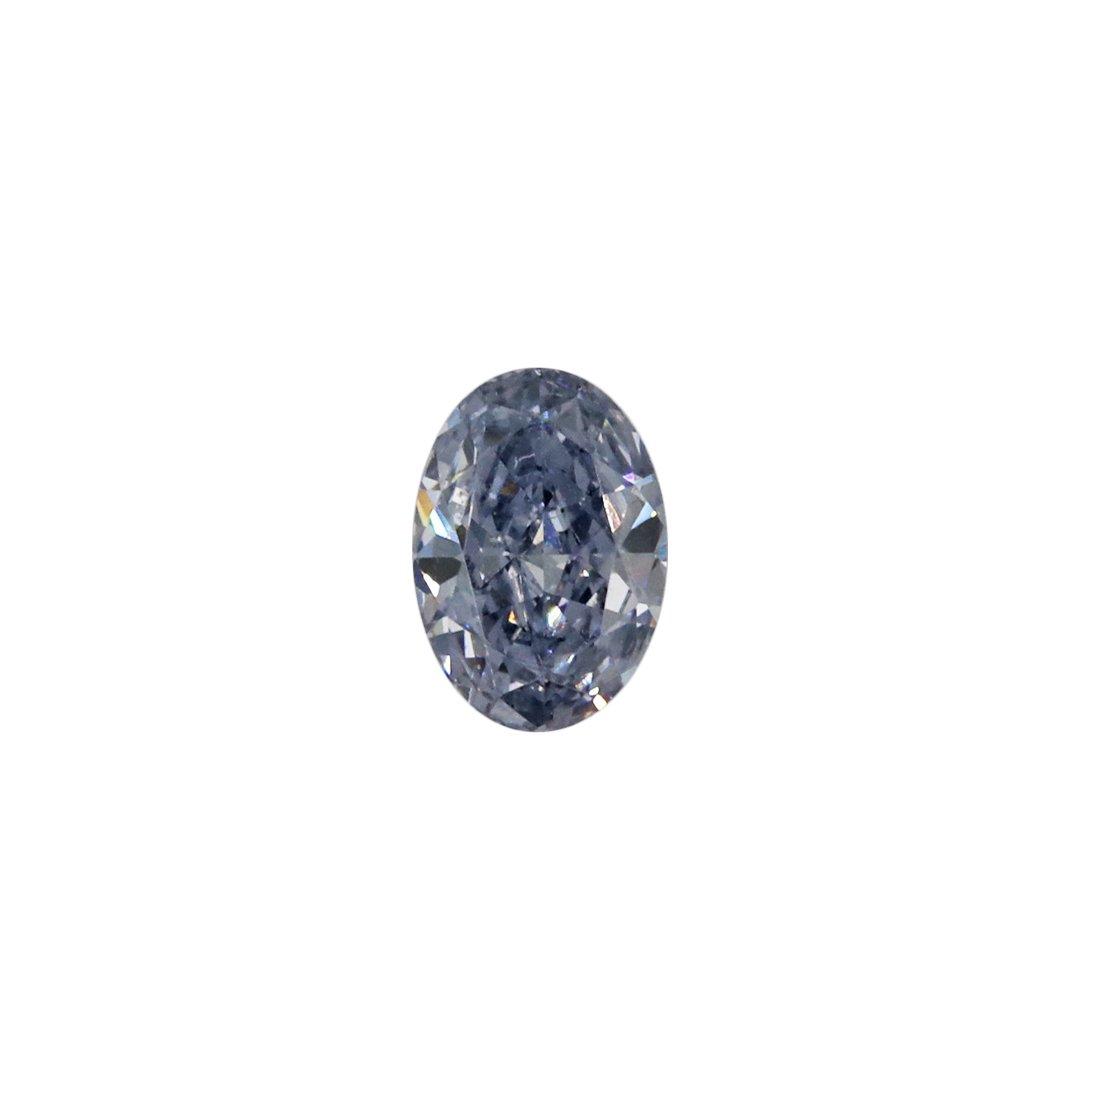 0.11ct Natural Fancy Intense Blue Grey, BL2+, VVS1, Argyle Pink Diamond